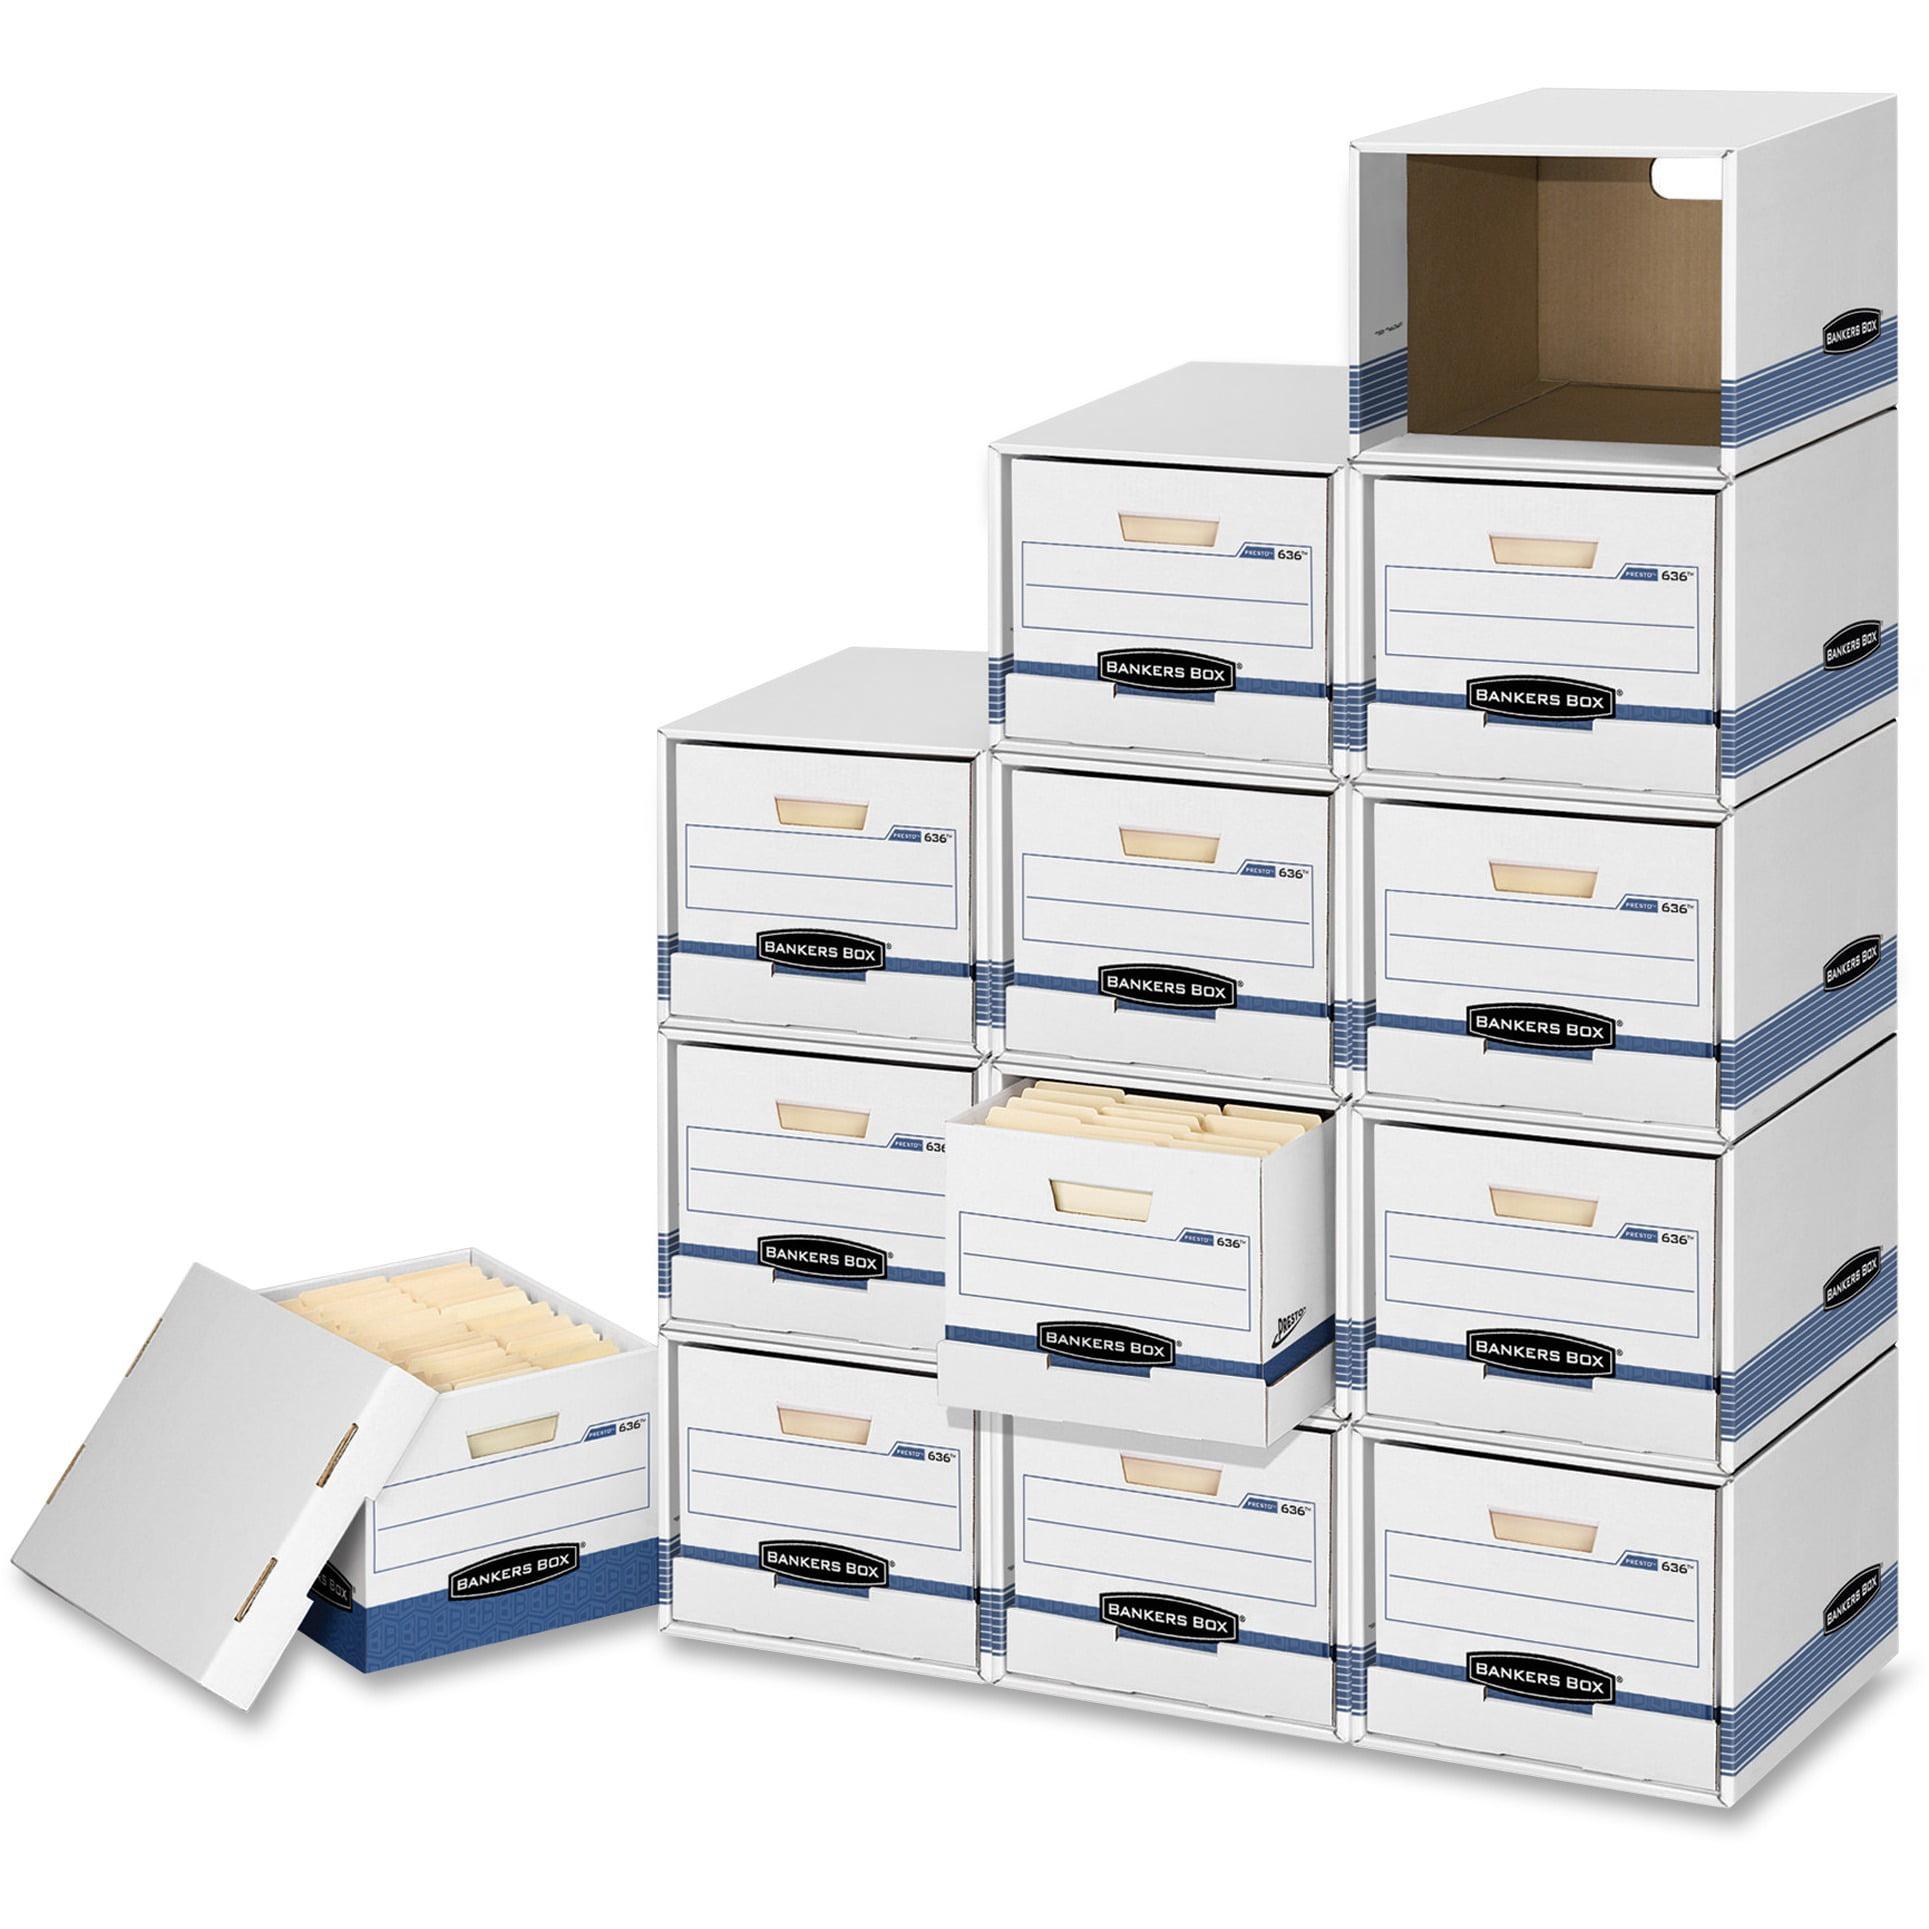 Bankers Box, FEL01626, File/Cube Box Shells, 6 / Carton, White,Blue